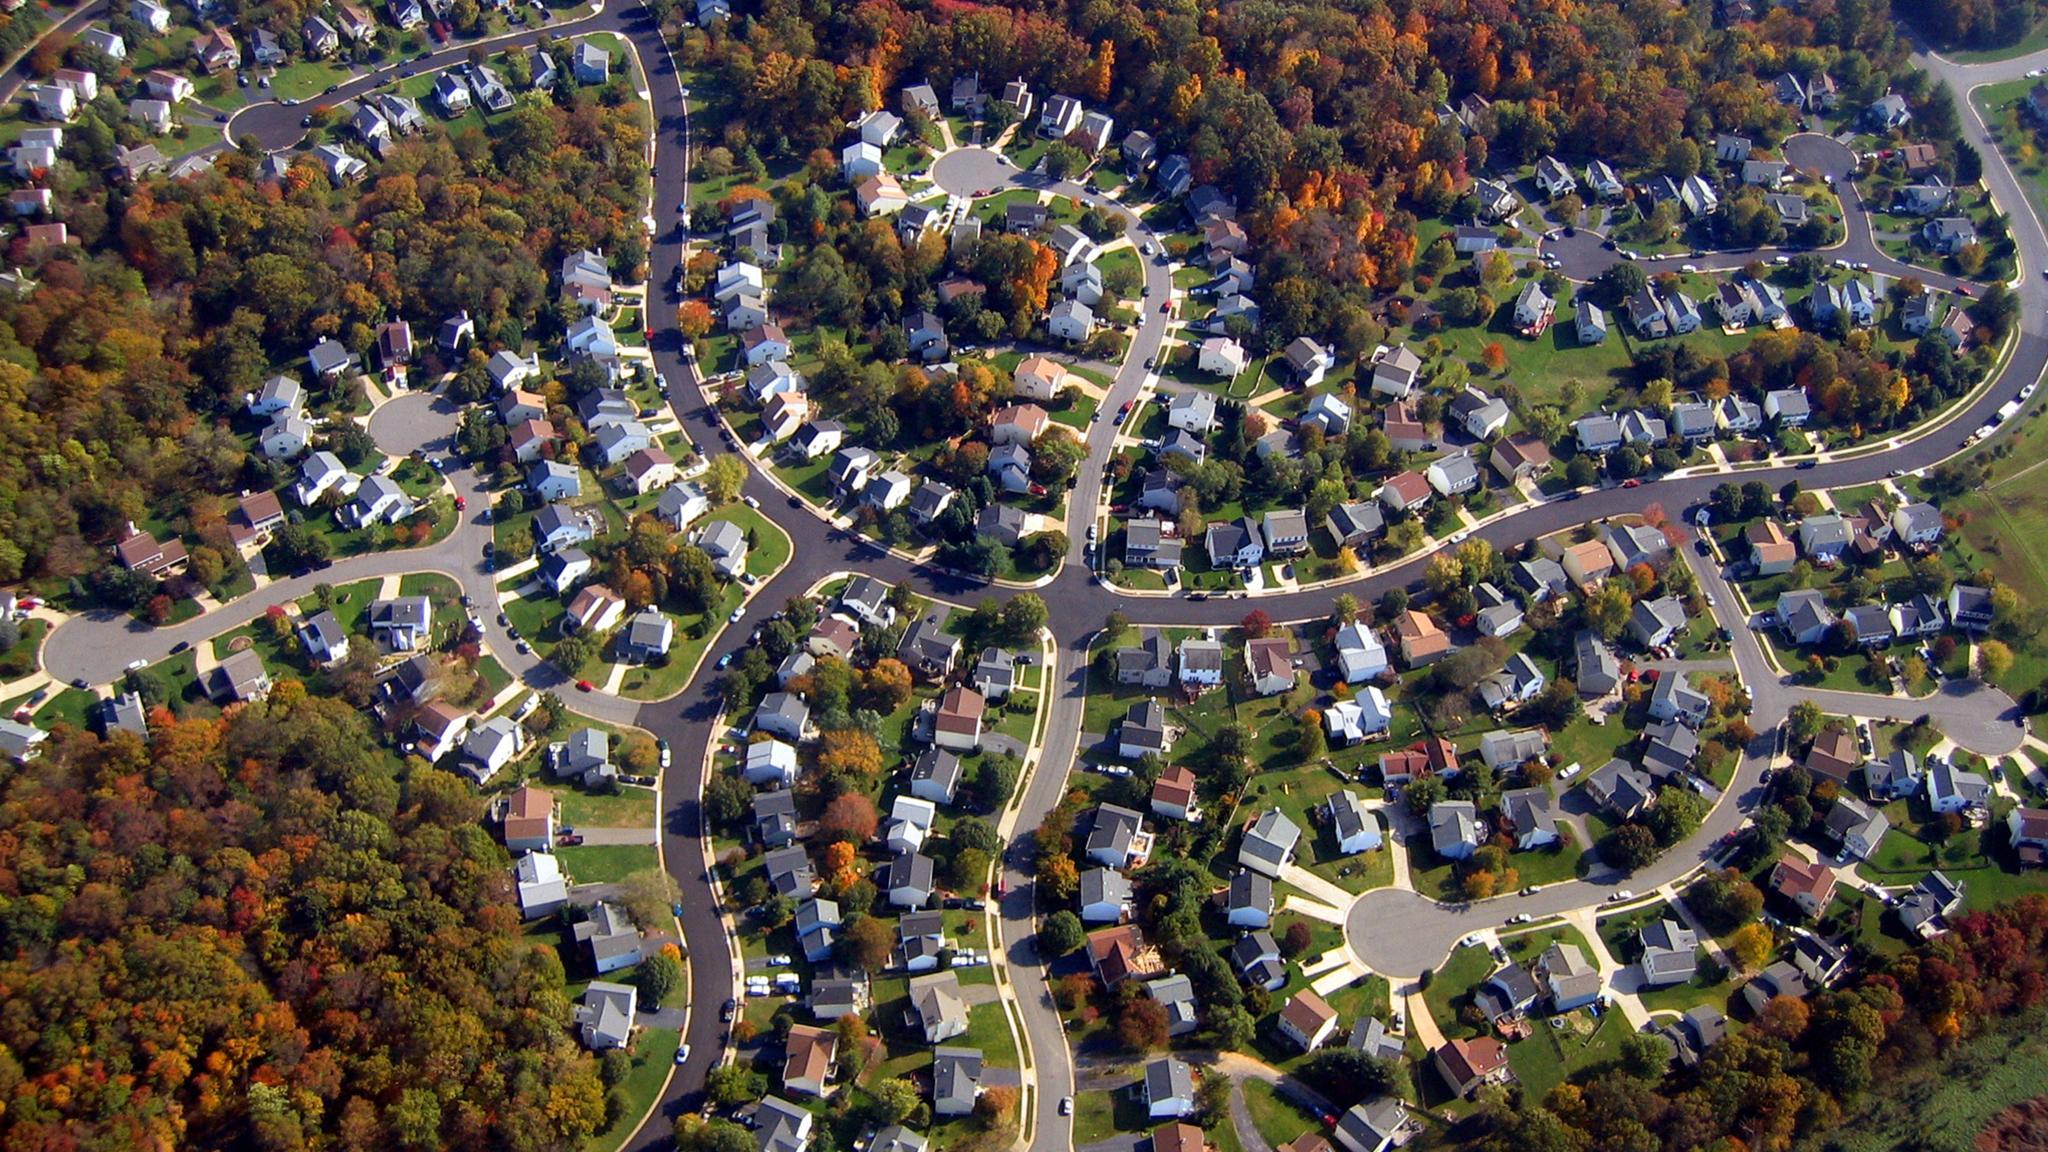 The Silver Economy: Downsizers transform US housing landscape